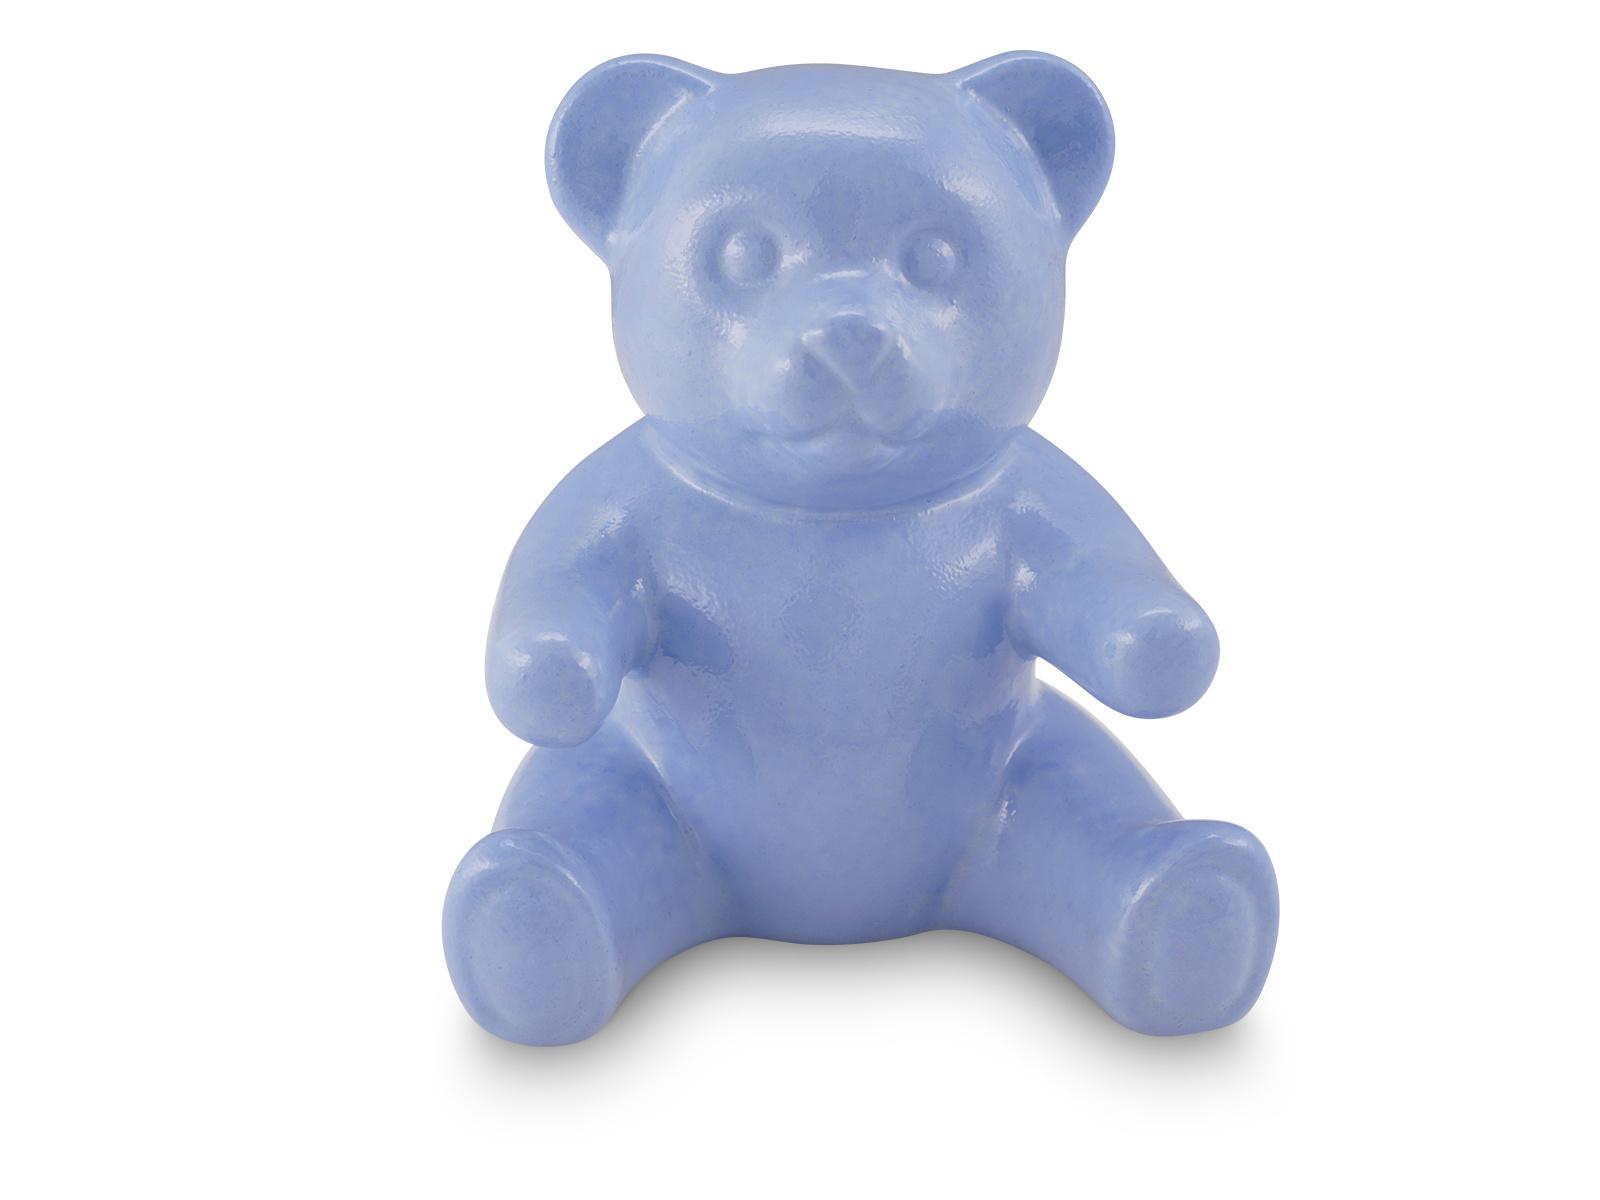 Kinder urn blauwe beer - porselein